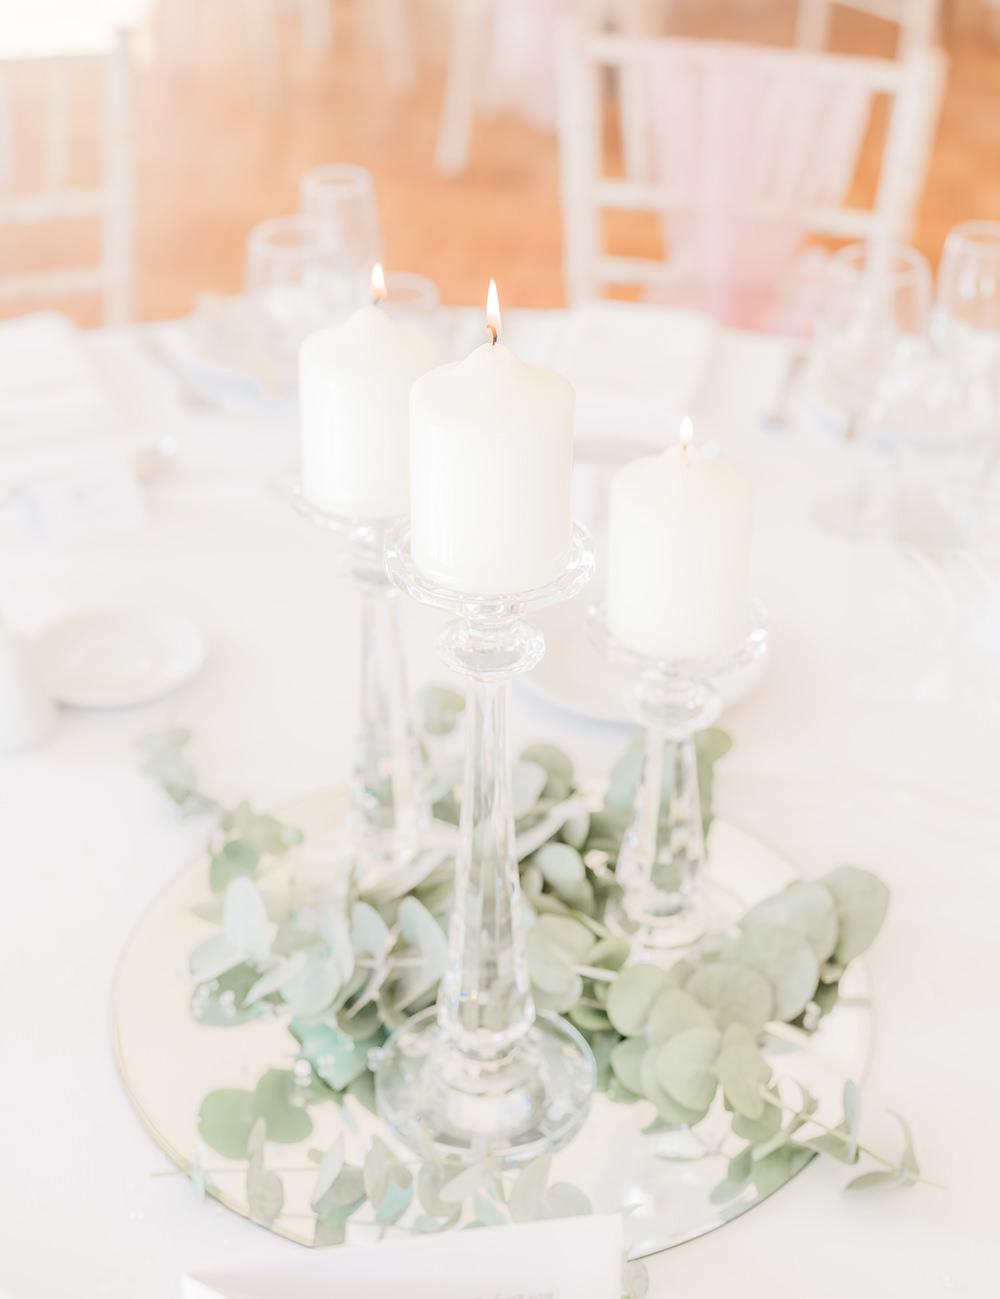 Centrepiece Candles Foliage Greenery Mirror Beamish Hall Wedding Carn Patrick Photography